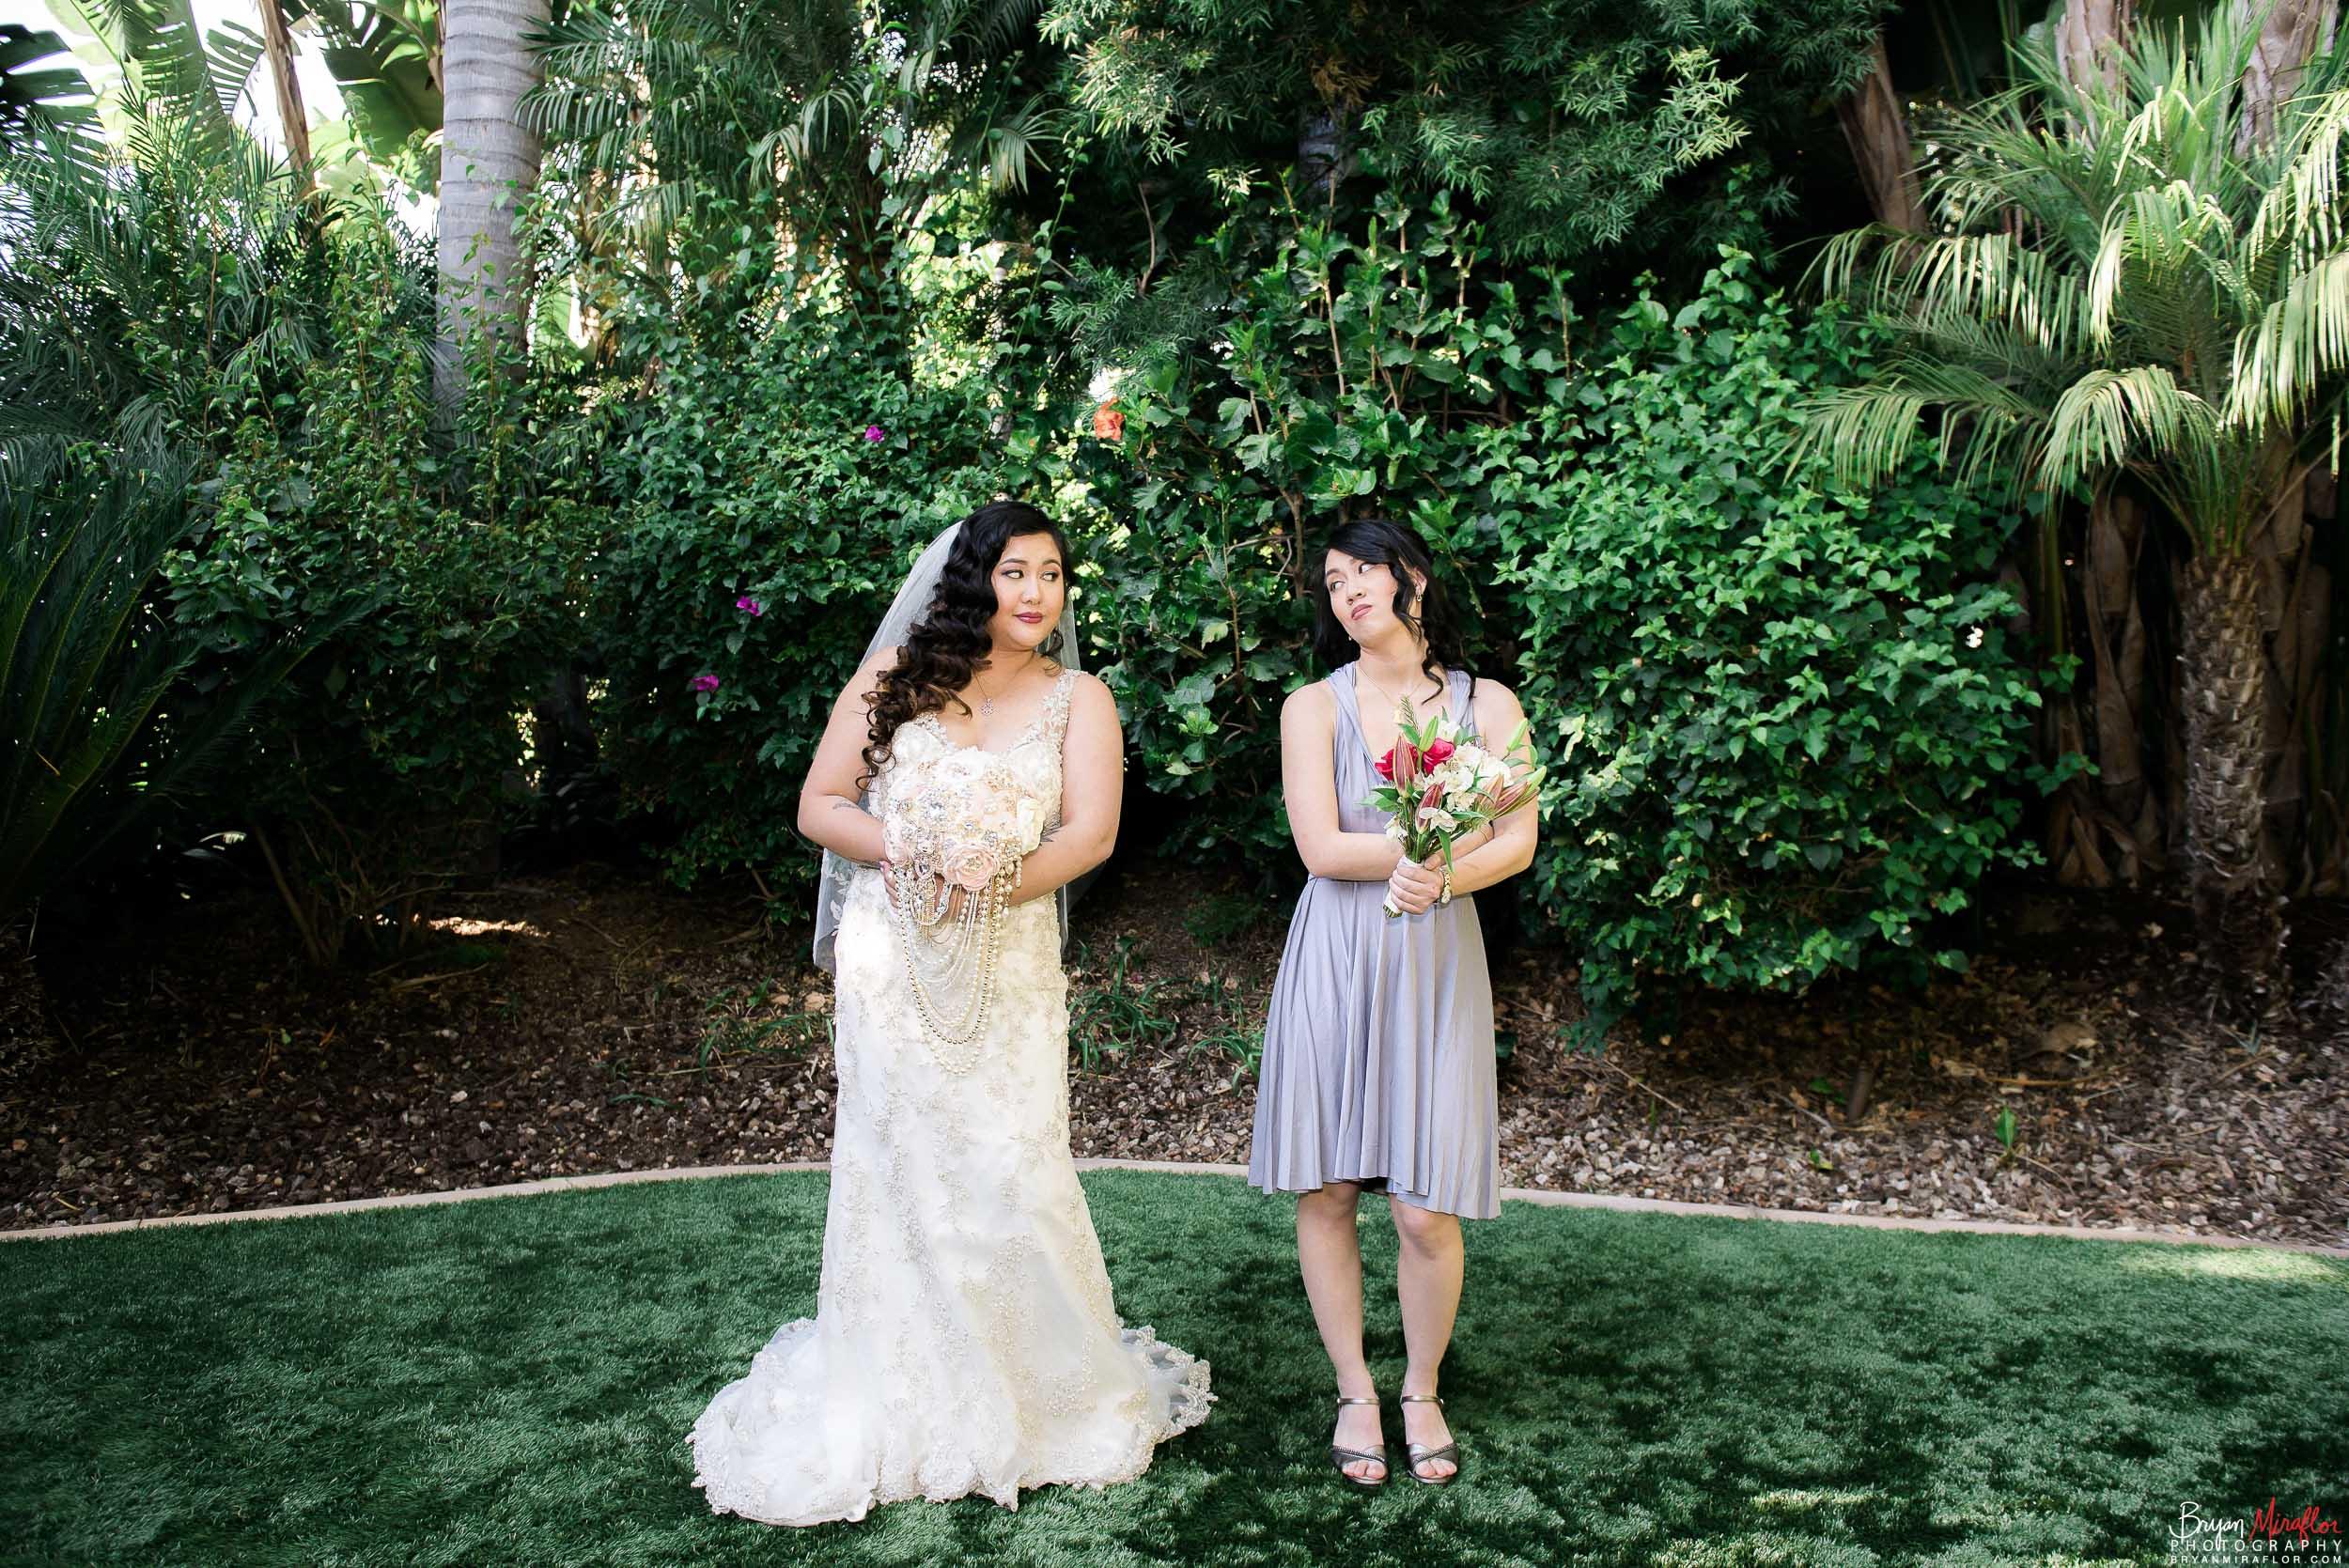 Bryan-Miraflor-Photography-Hannah-Jonathan-Married-Grand-Traditions-Estate-Gardens-Fallbrook-20171222-125.jpg